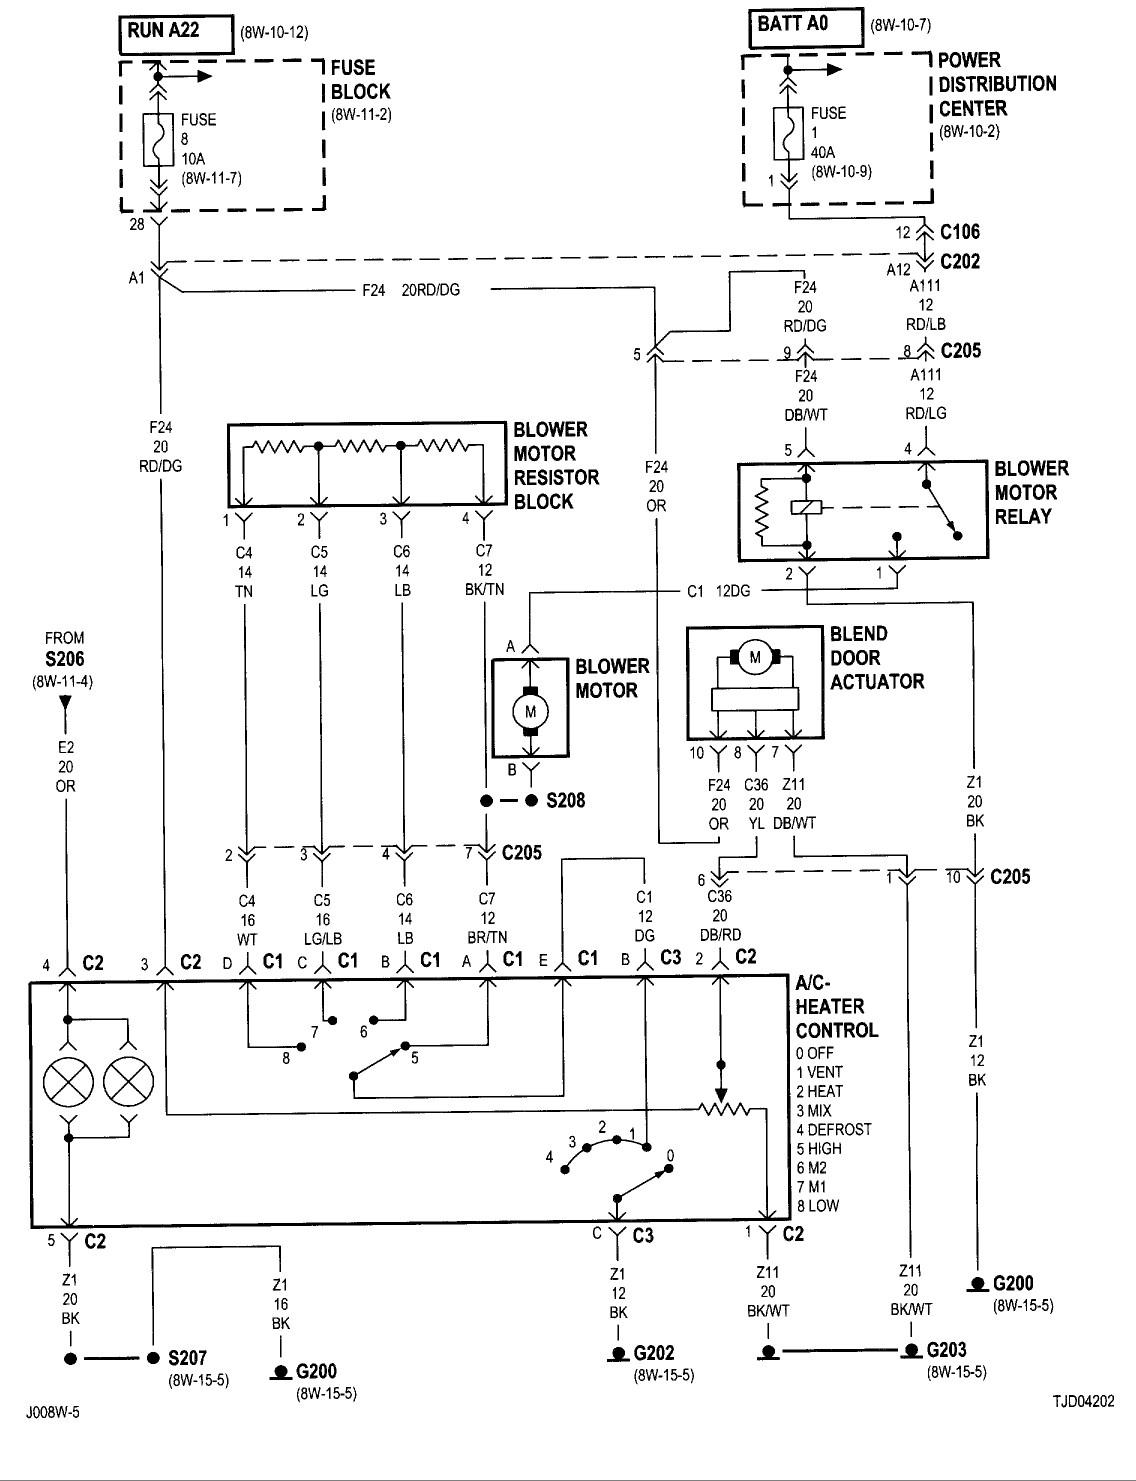 97 Tj Wiring Diagram | Schematic Diagram - 2000 Jeep Grand Cherokee Wiring Diagram